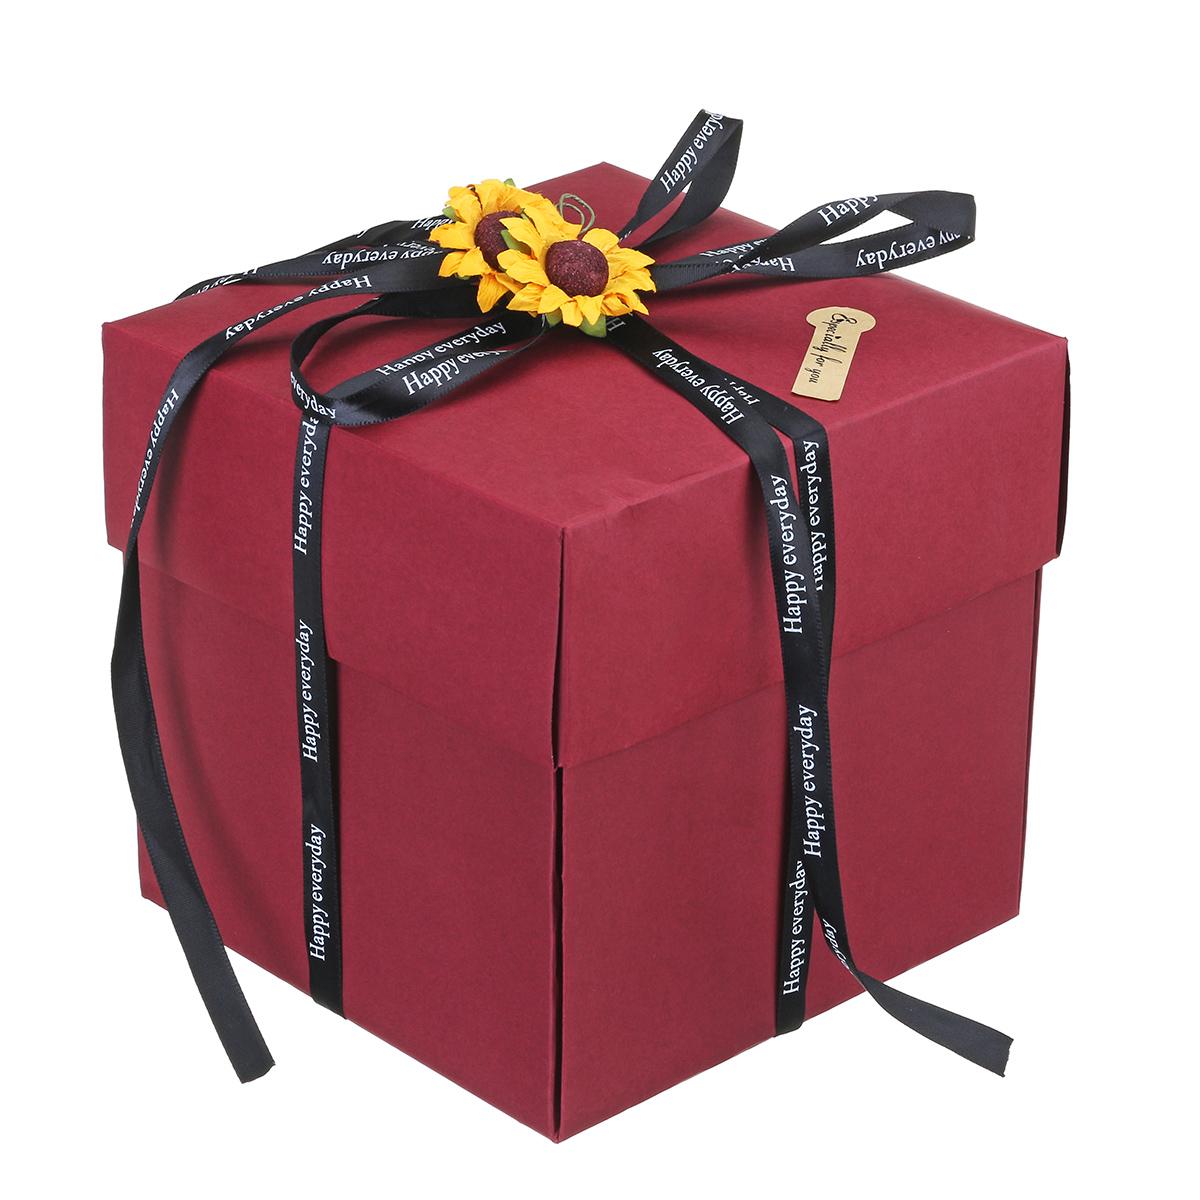 Creative DIY Photo Album Gift Surprise Mystery Gifts Gift Box Valentine's Day Scrapbook Wedding Xmas